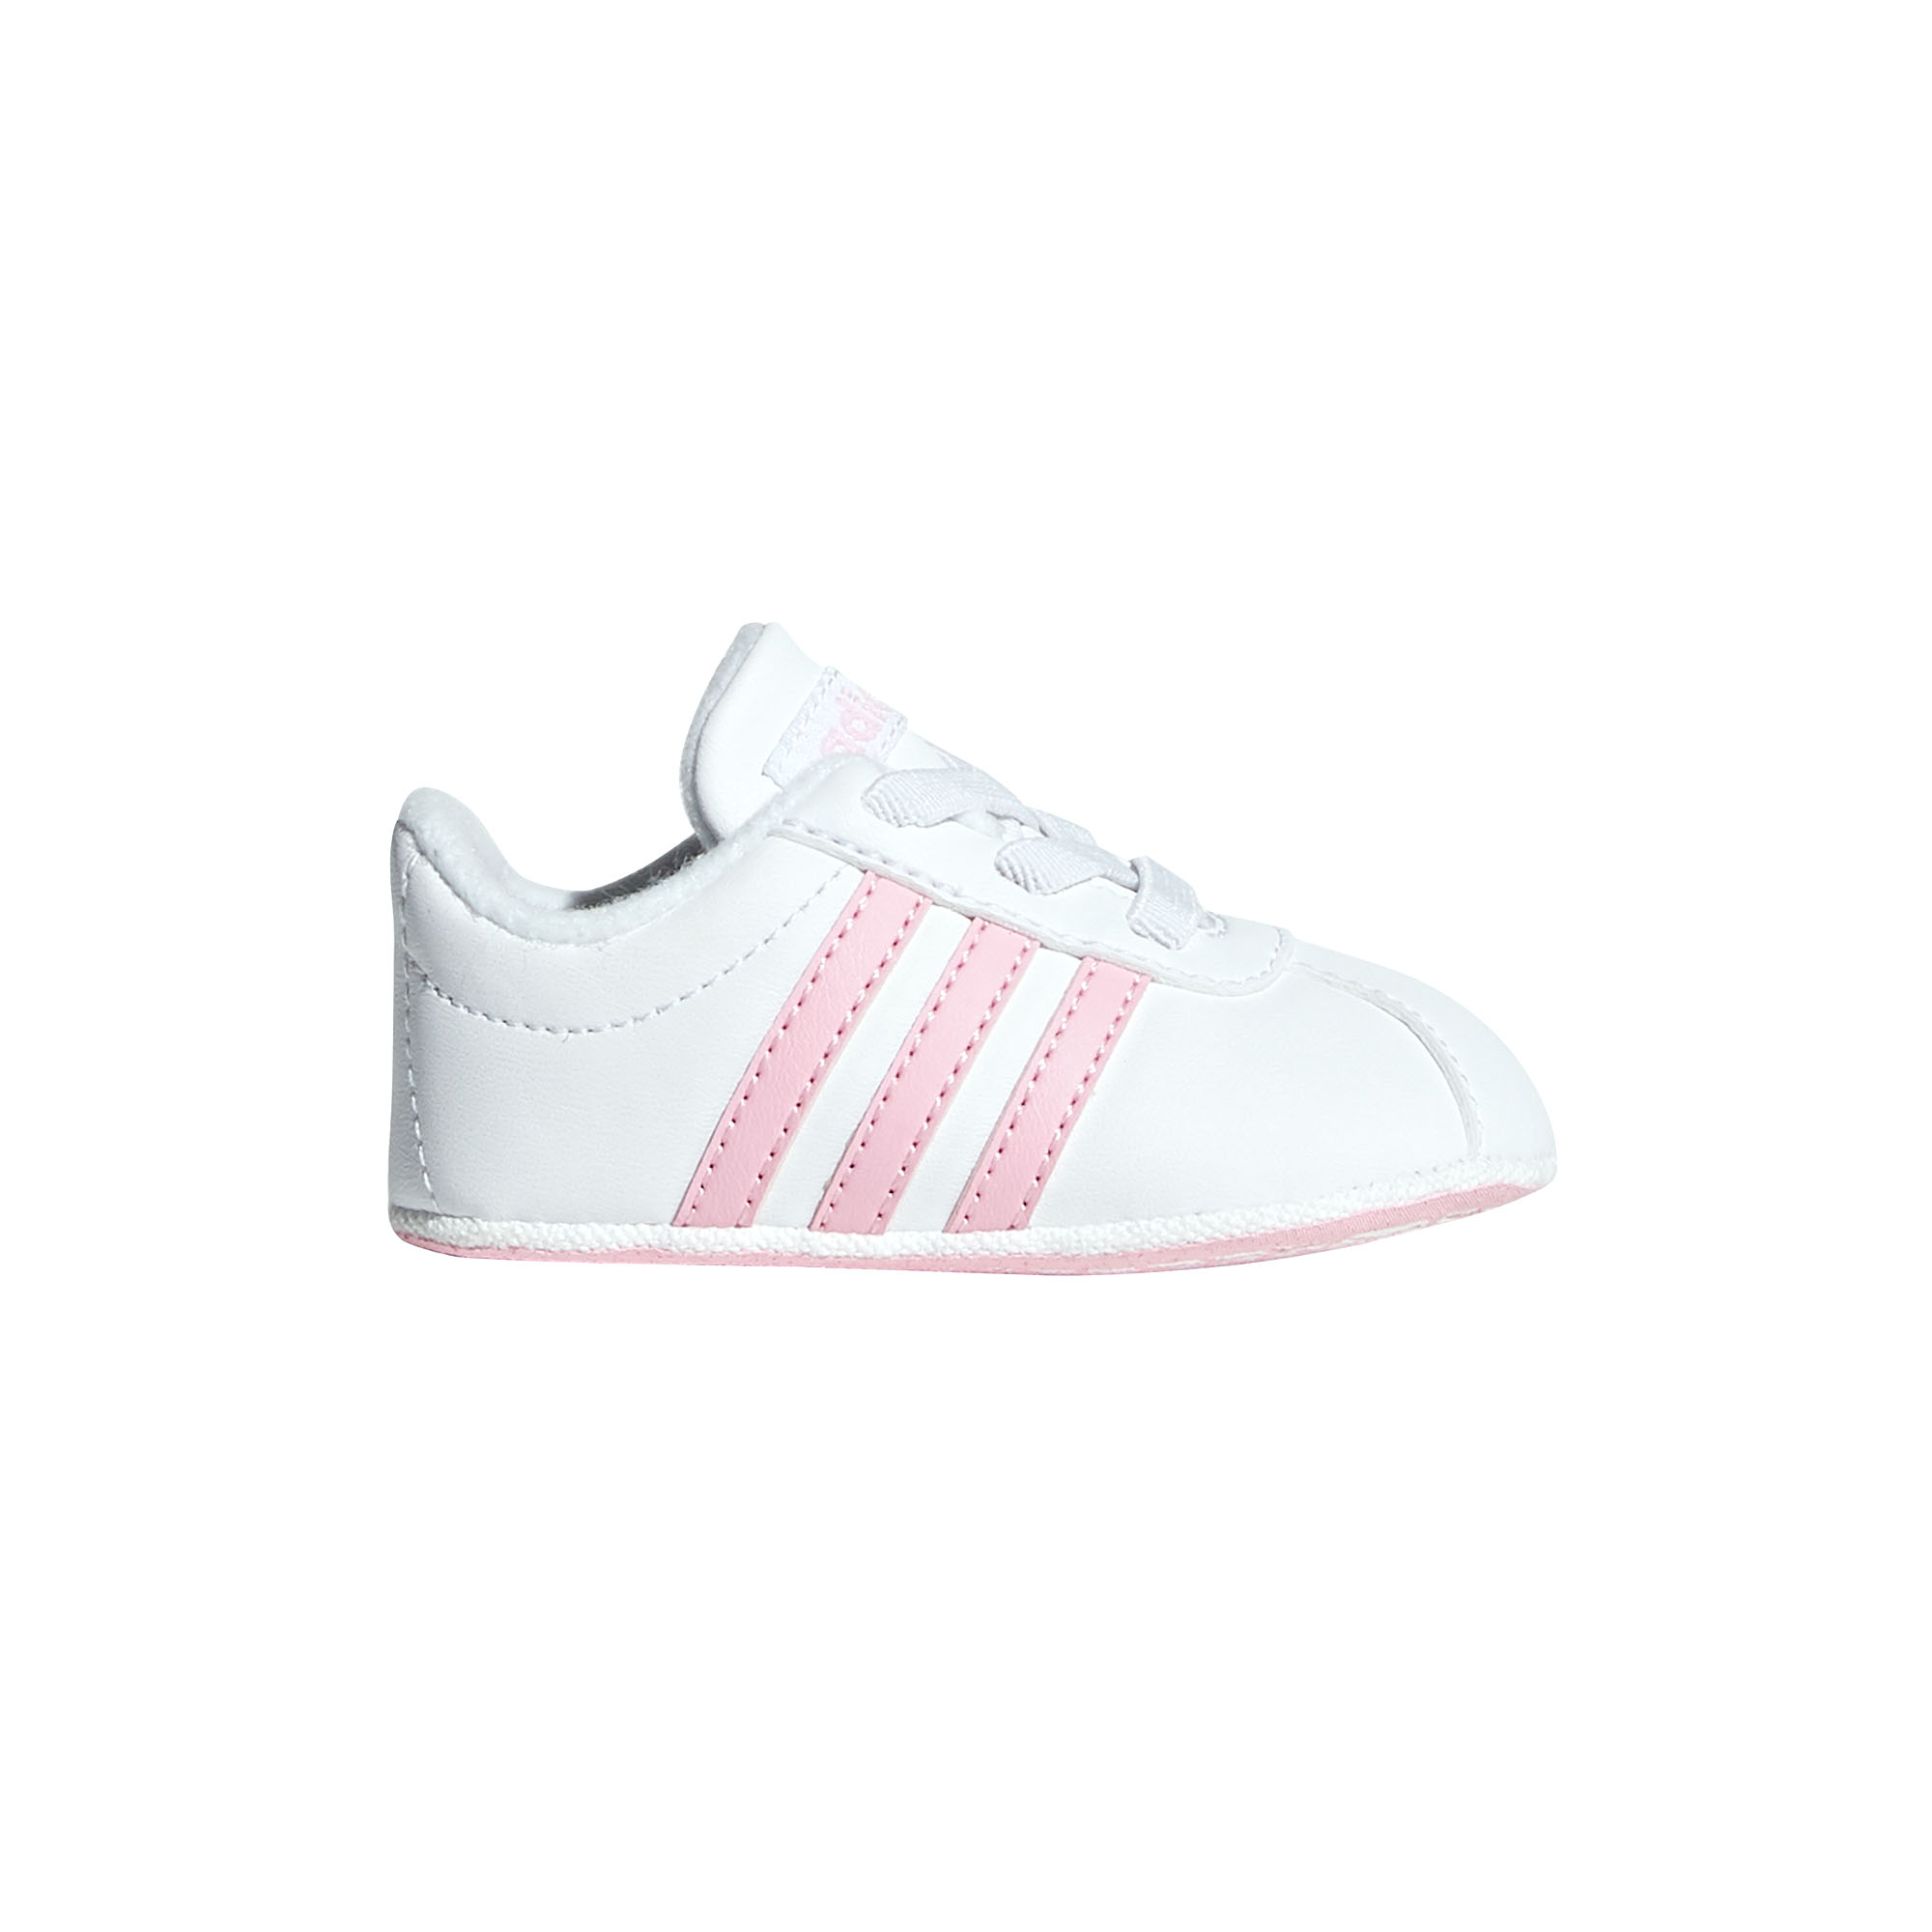 27aac51d Details about adidas VL Court 2.0 Infant Baby Toddler Kids Girls Crib Shoe  White/Pink - UK 3